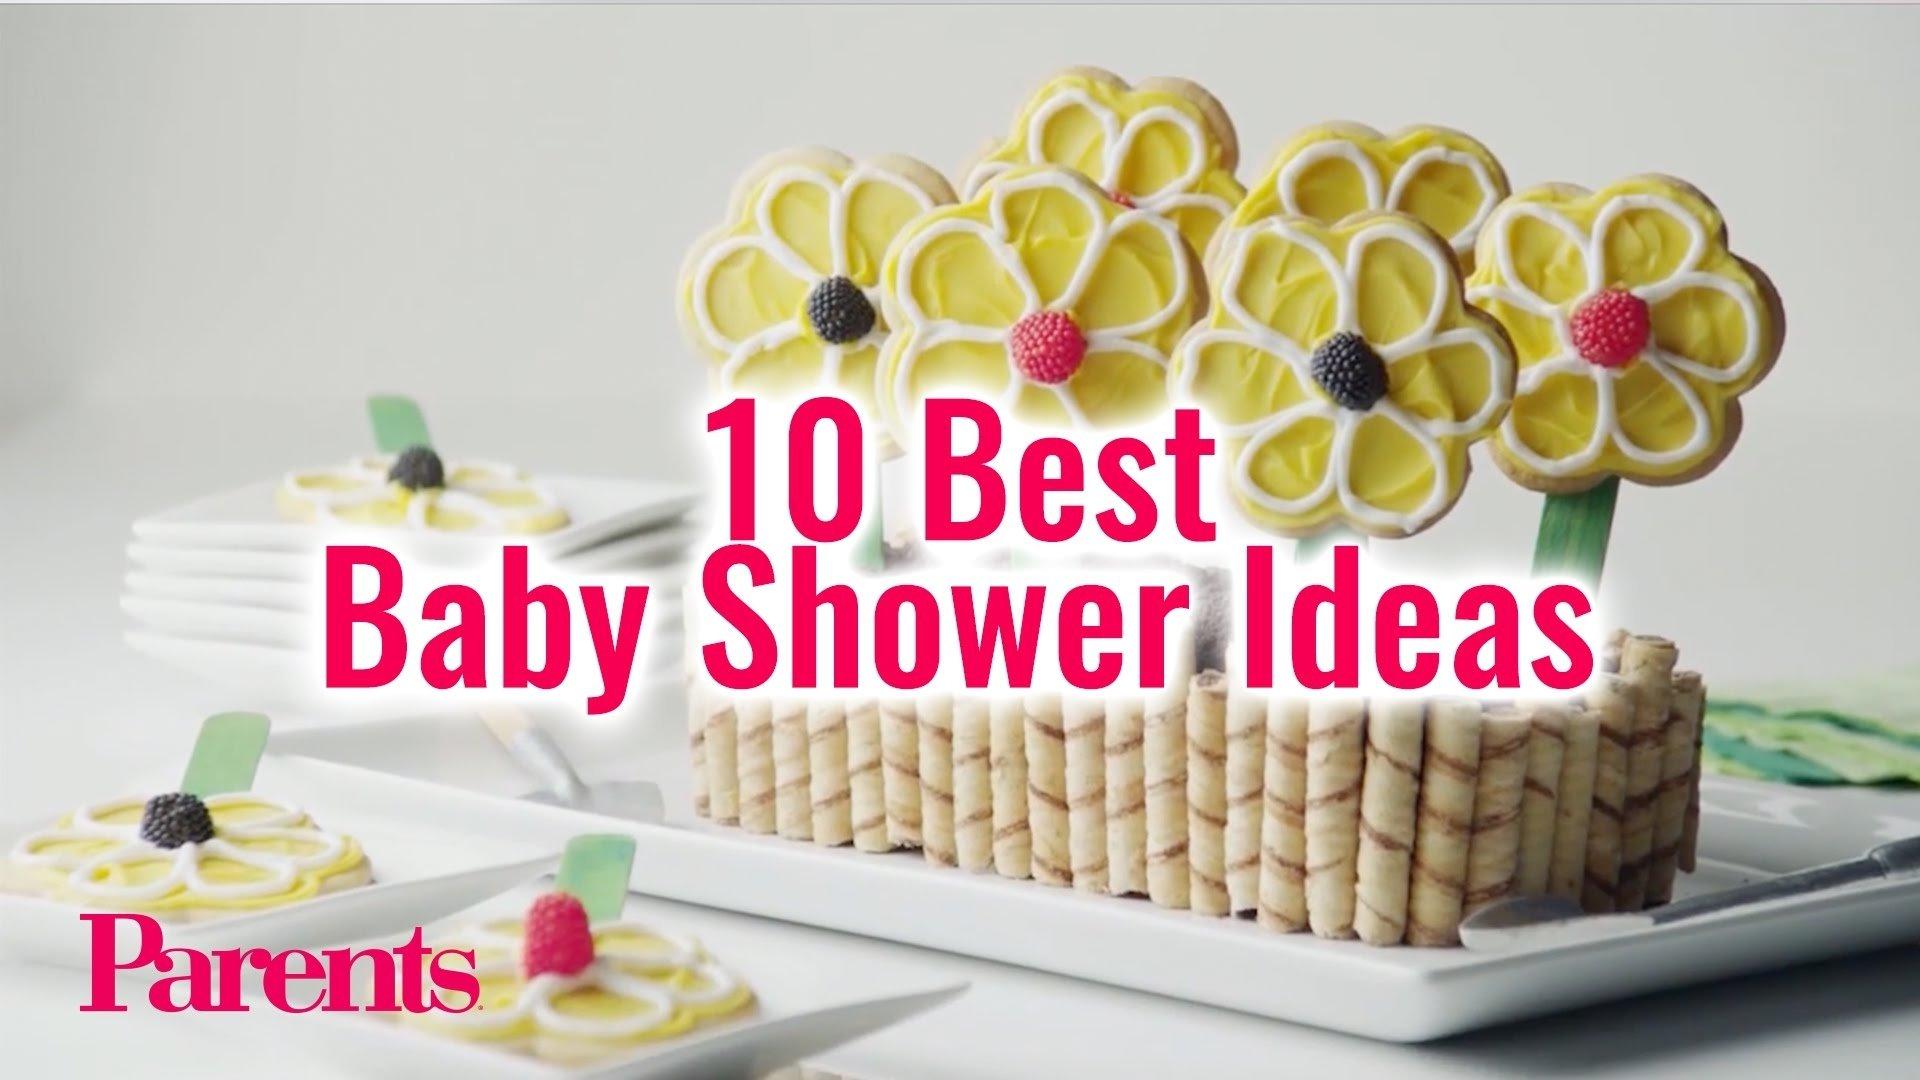 10 Gorgeous Best Baby Shower Gift Ideas 10 best baby shower ideas parents youtube 2020